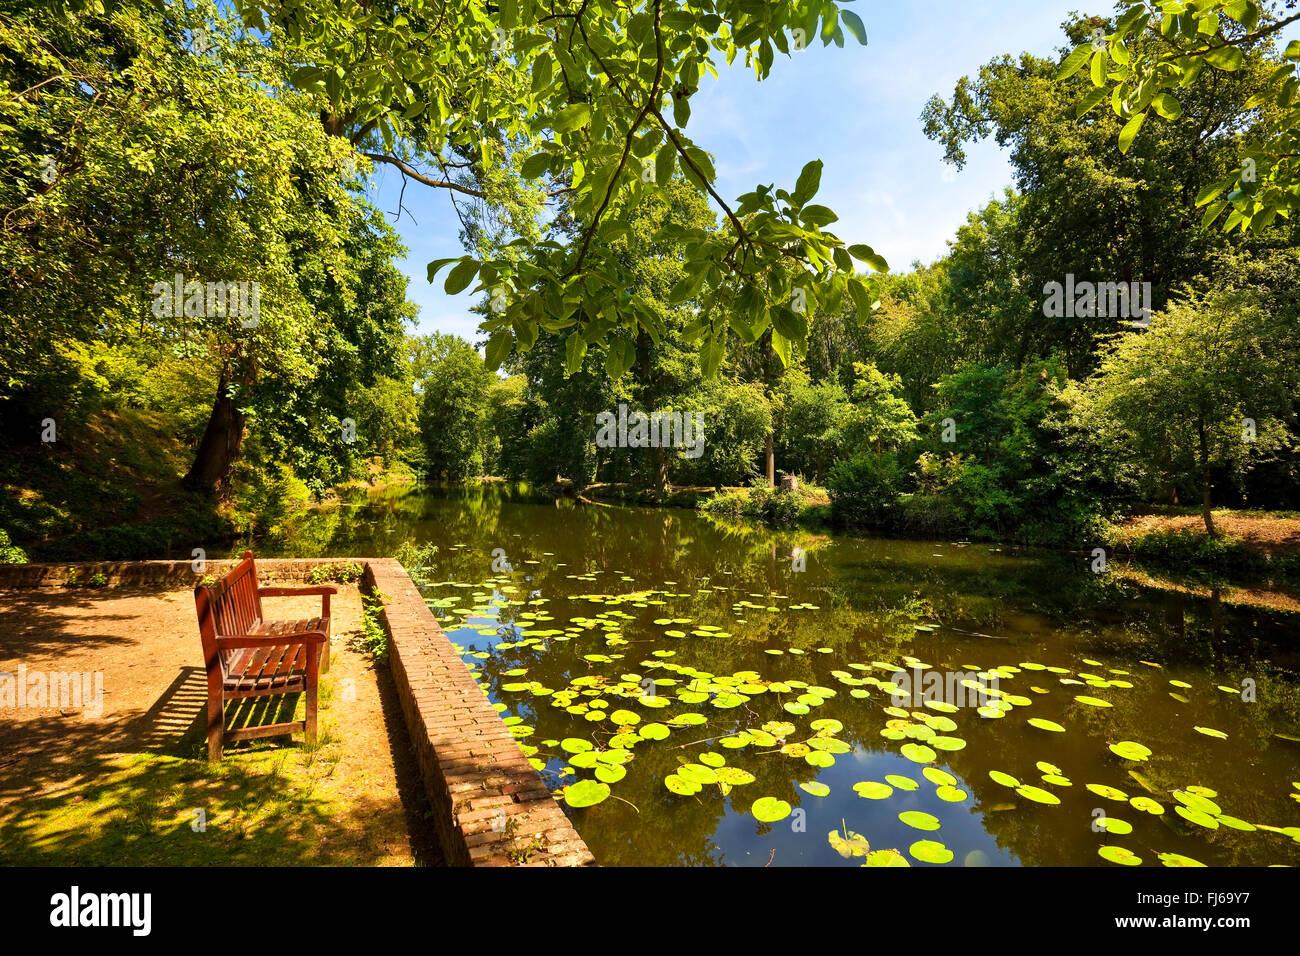 palace garden of Castle Rheydt, Germany, North Rhine-Westphalia, Lower Rhine, Moenchengladbach - Stock Image